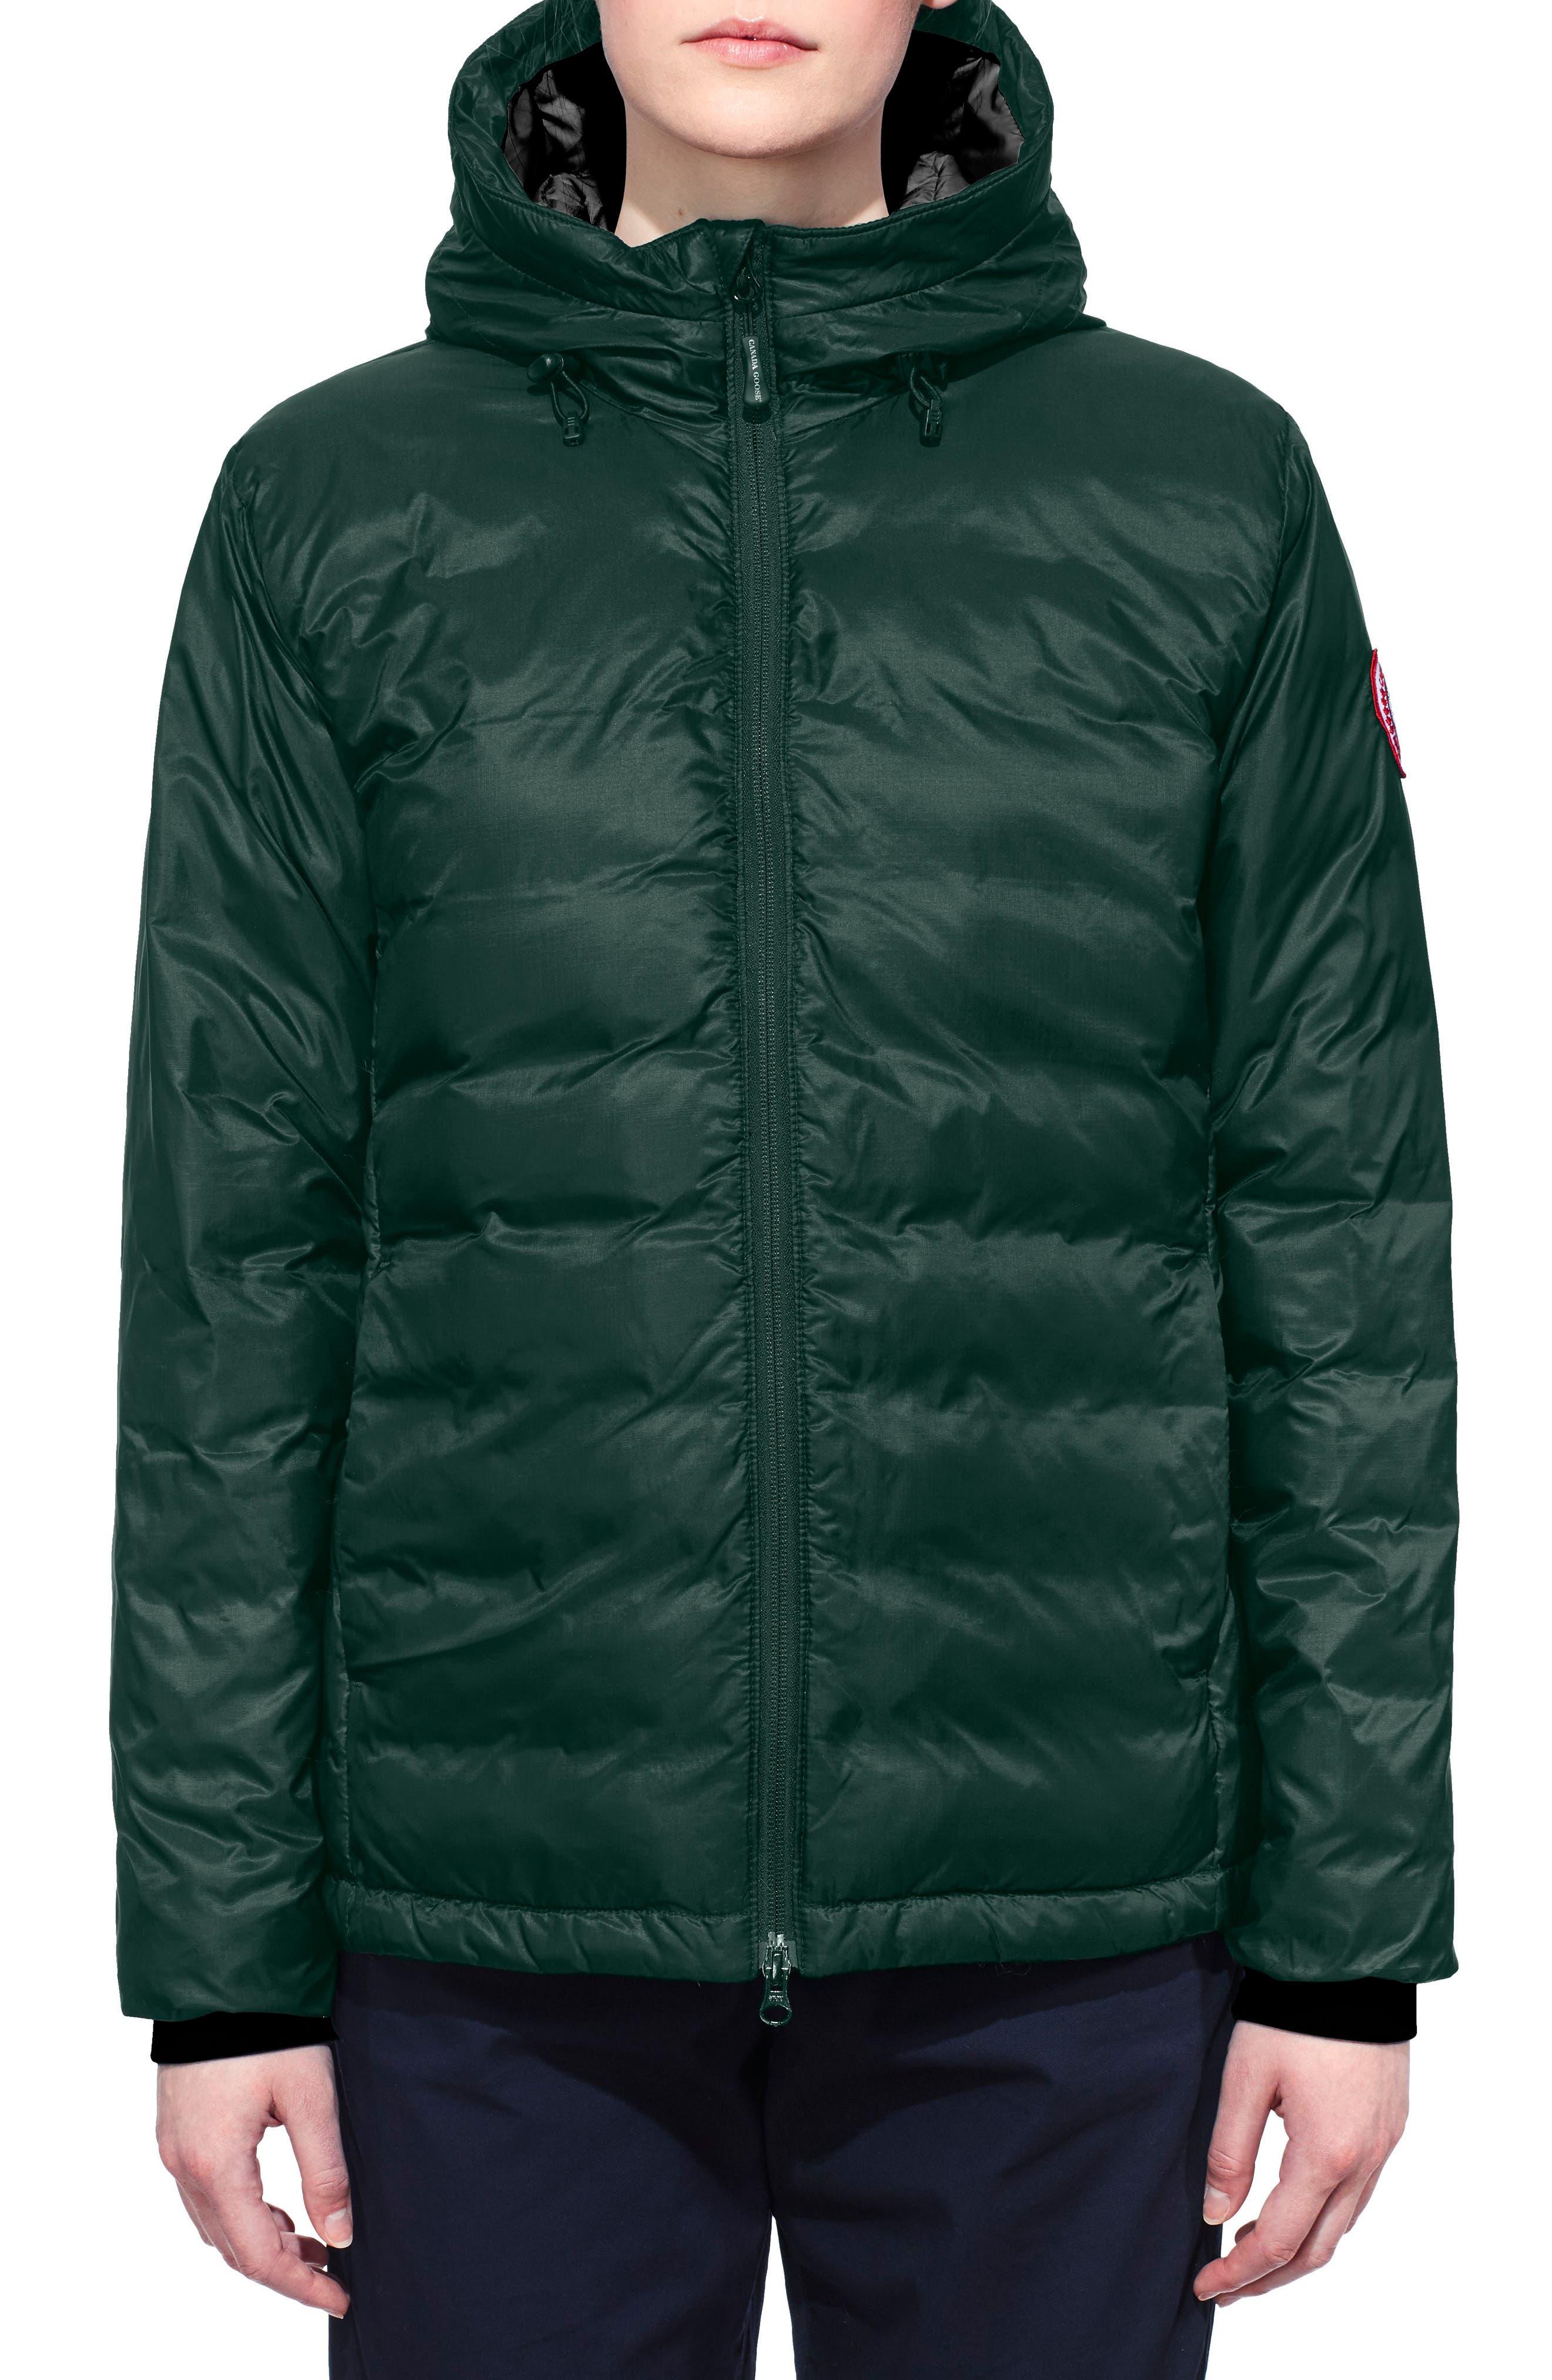 Camp Down Jacket,                         Main,                         color, SPRUCE/ BLACK